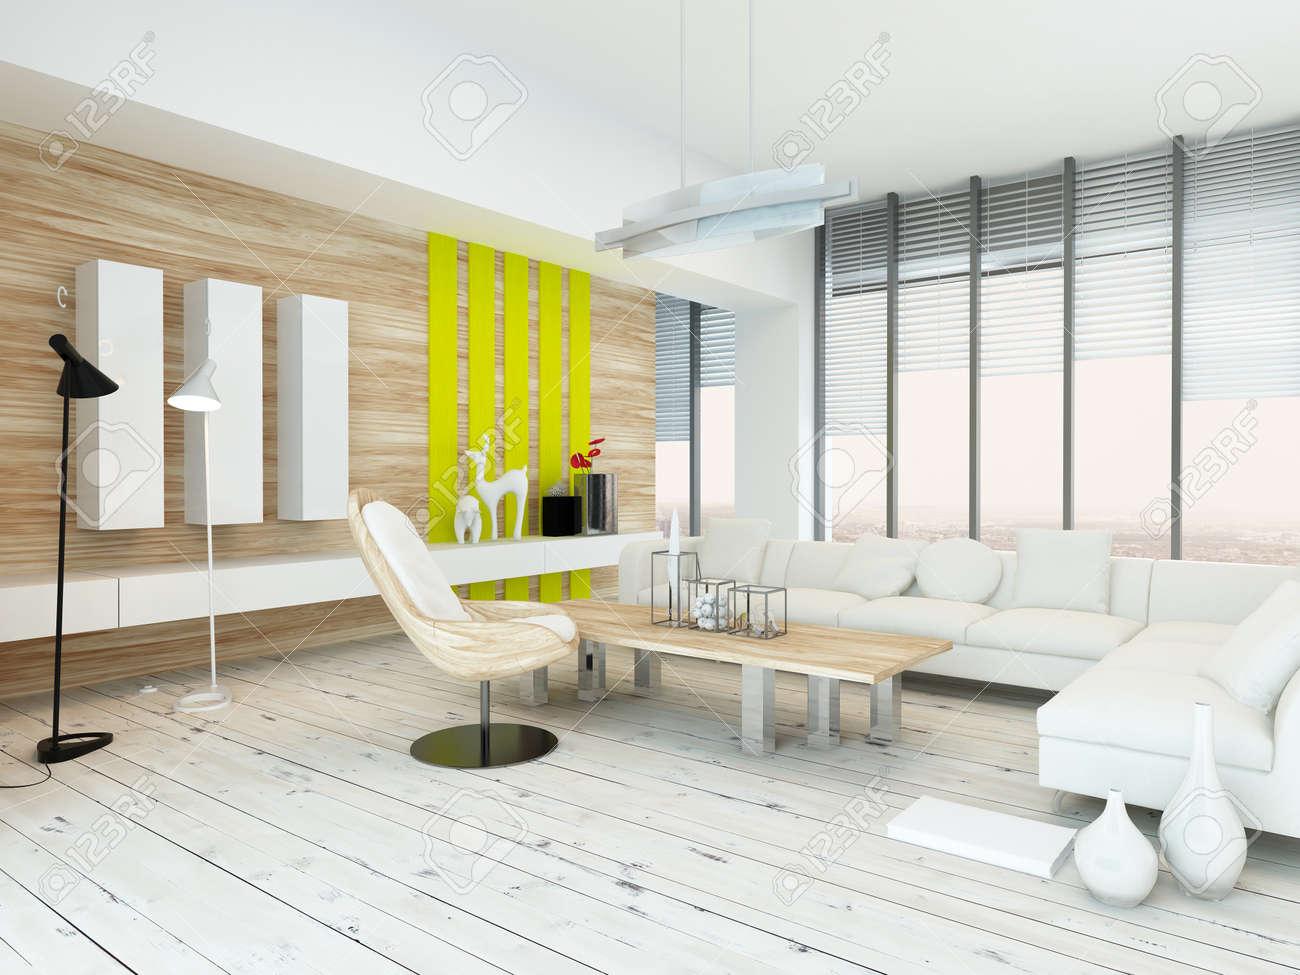 Rustic Wood Veneer Finish Living Room Interior With Natural Wood ...